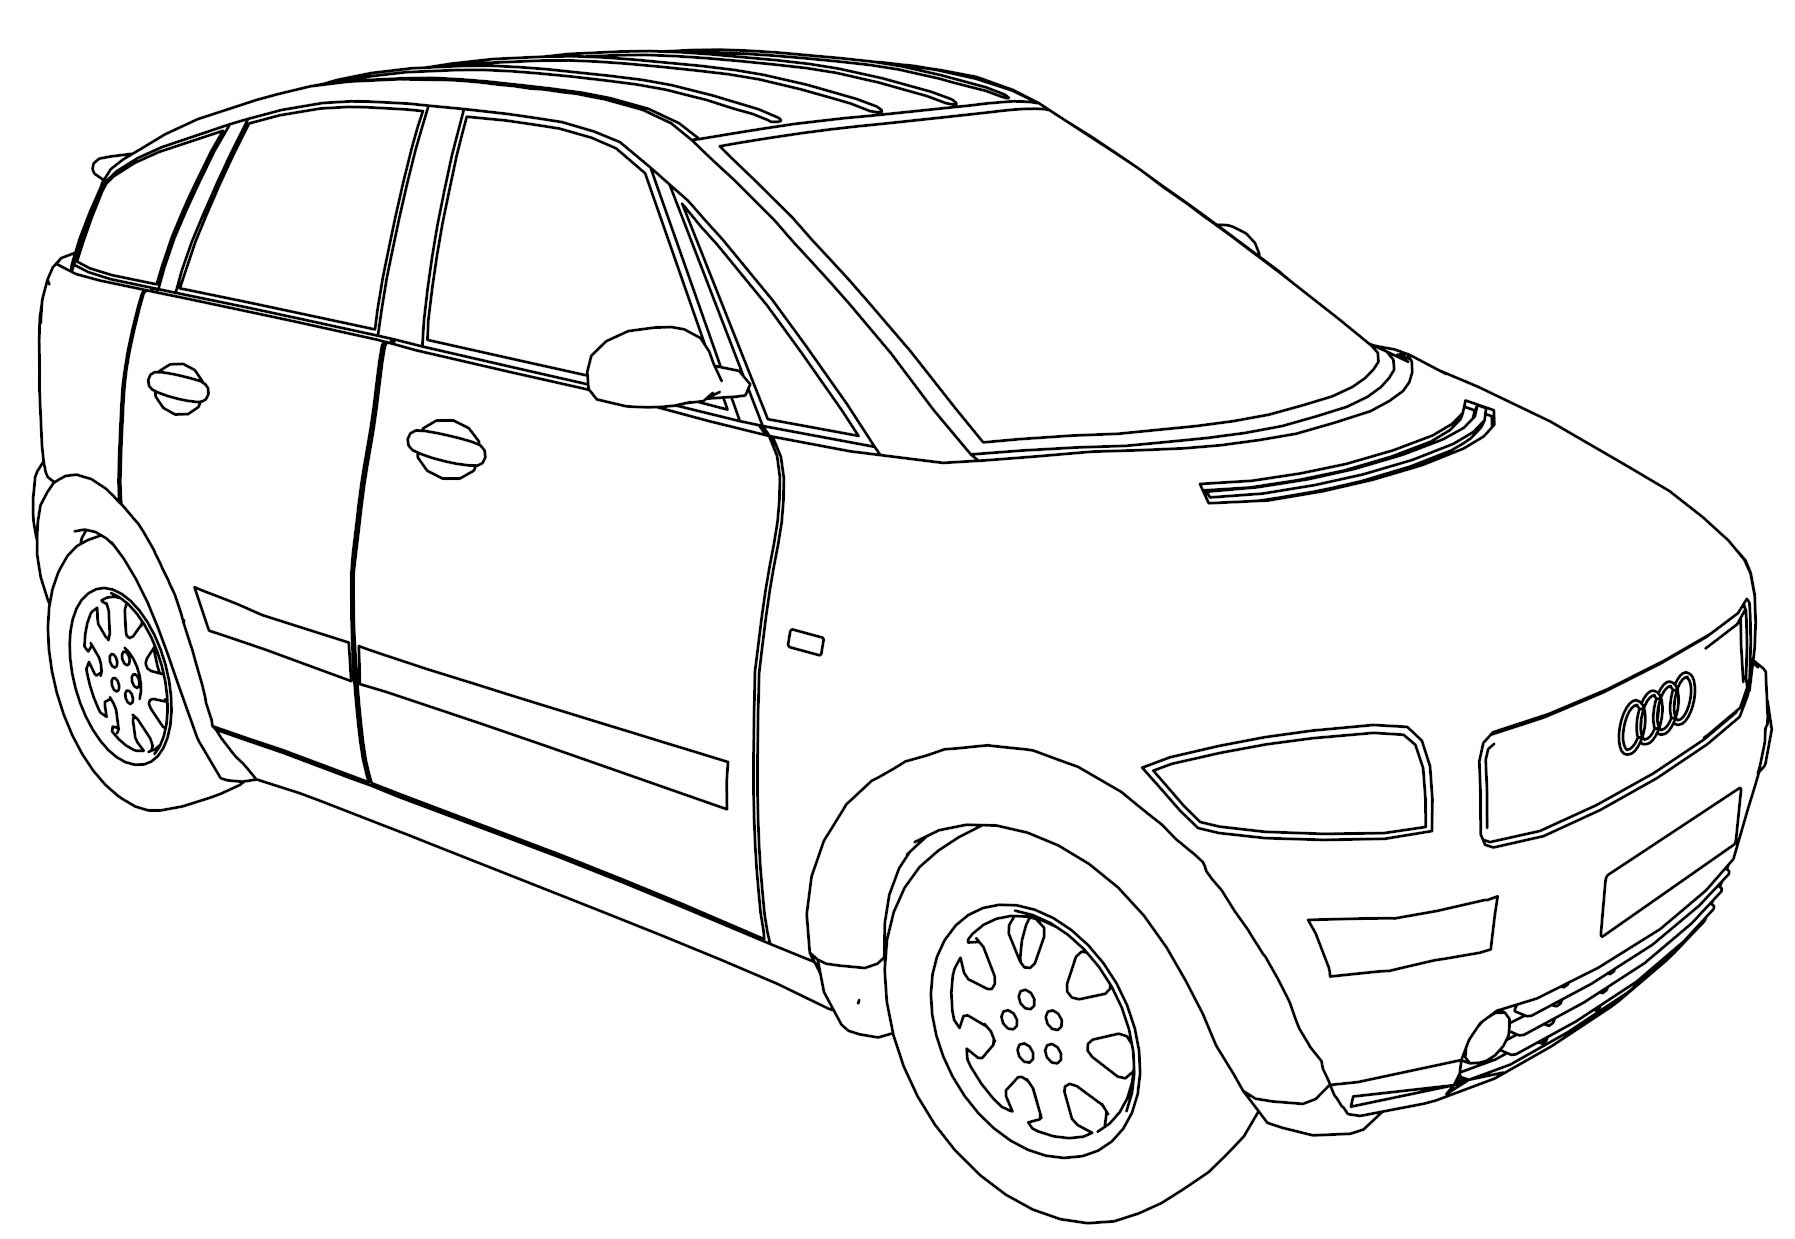 Audi A2 Car Coloring Page